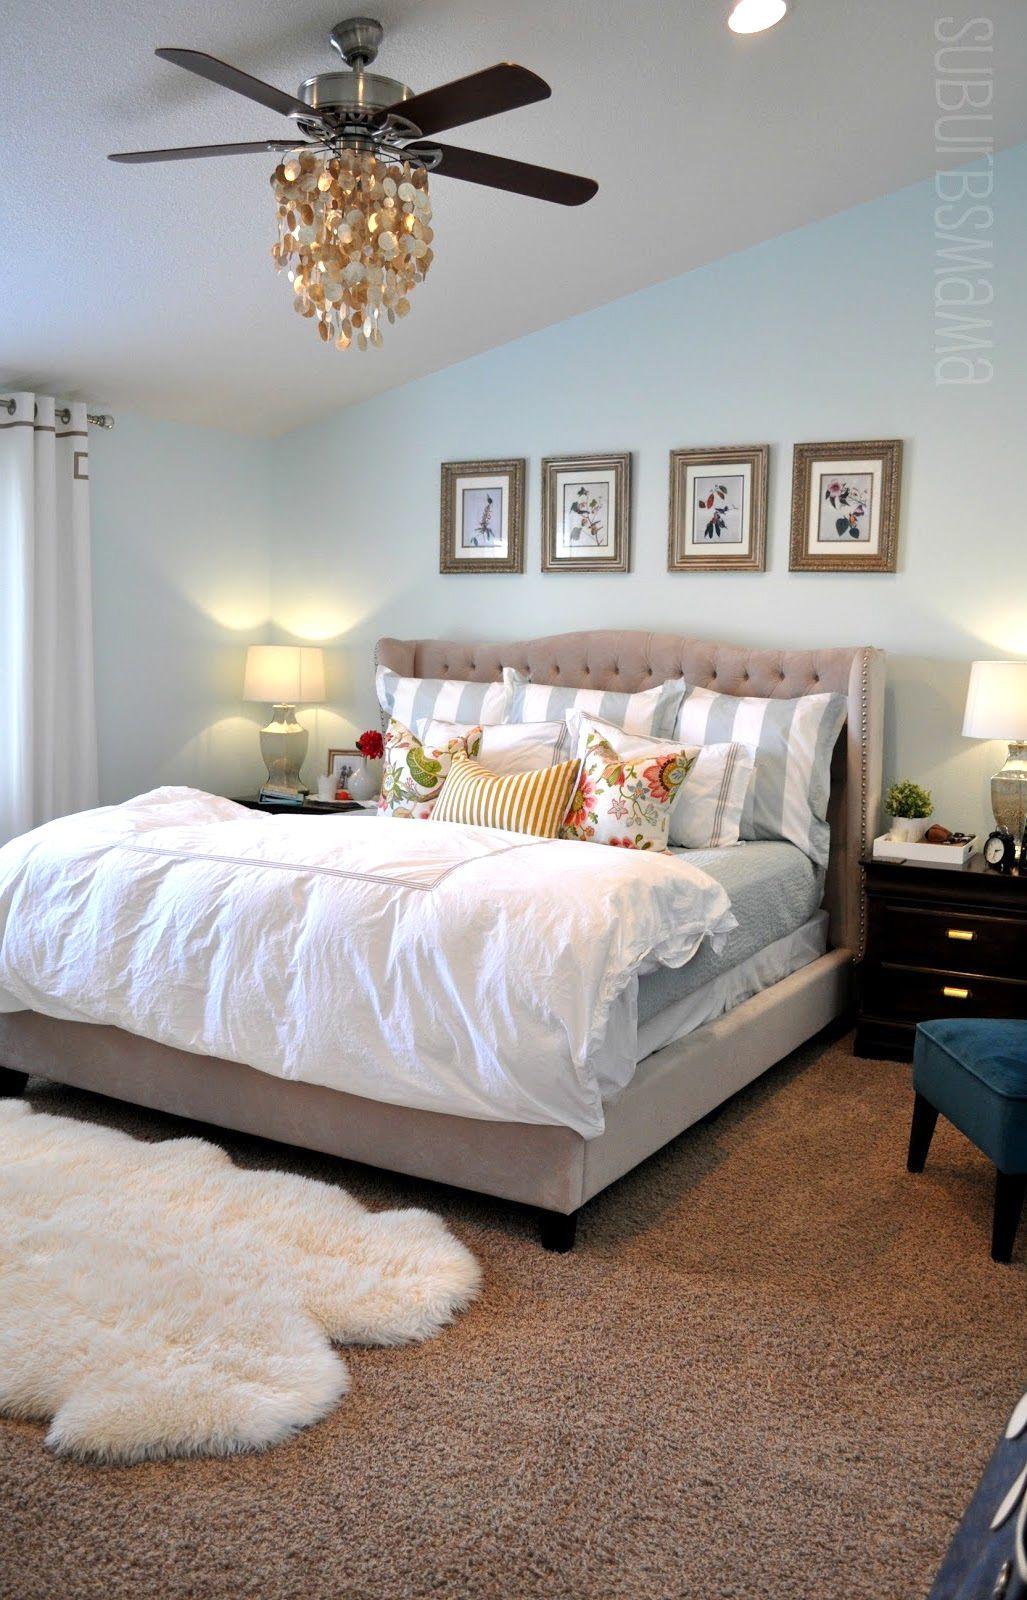 Master bedroom bedroom ceiling decor  Pin by Kelli Sabaka on Bed Ideas  Pinterest  Master bedroom